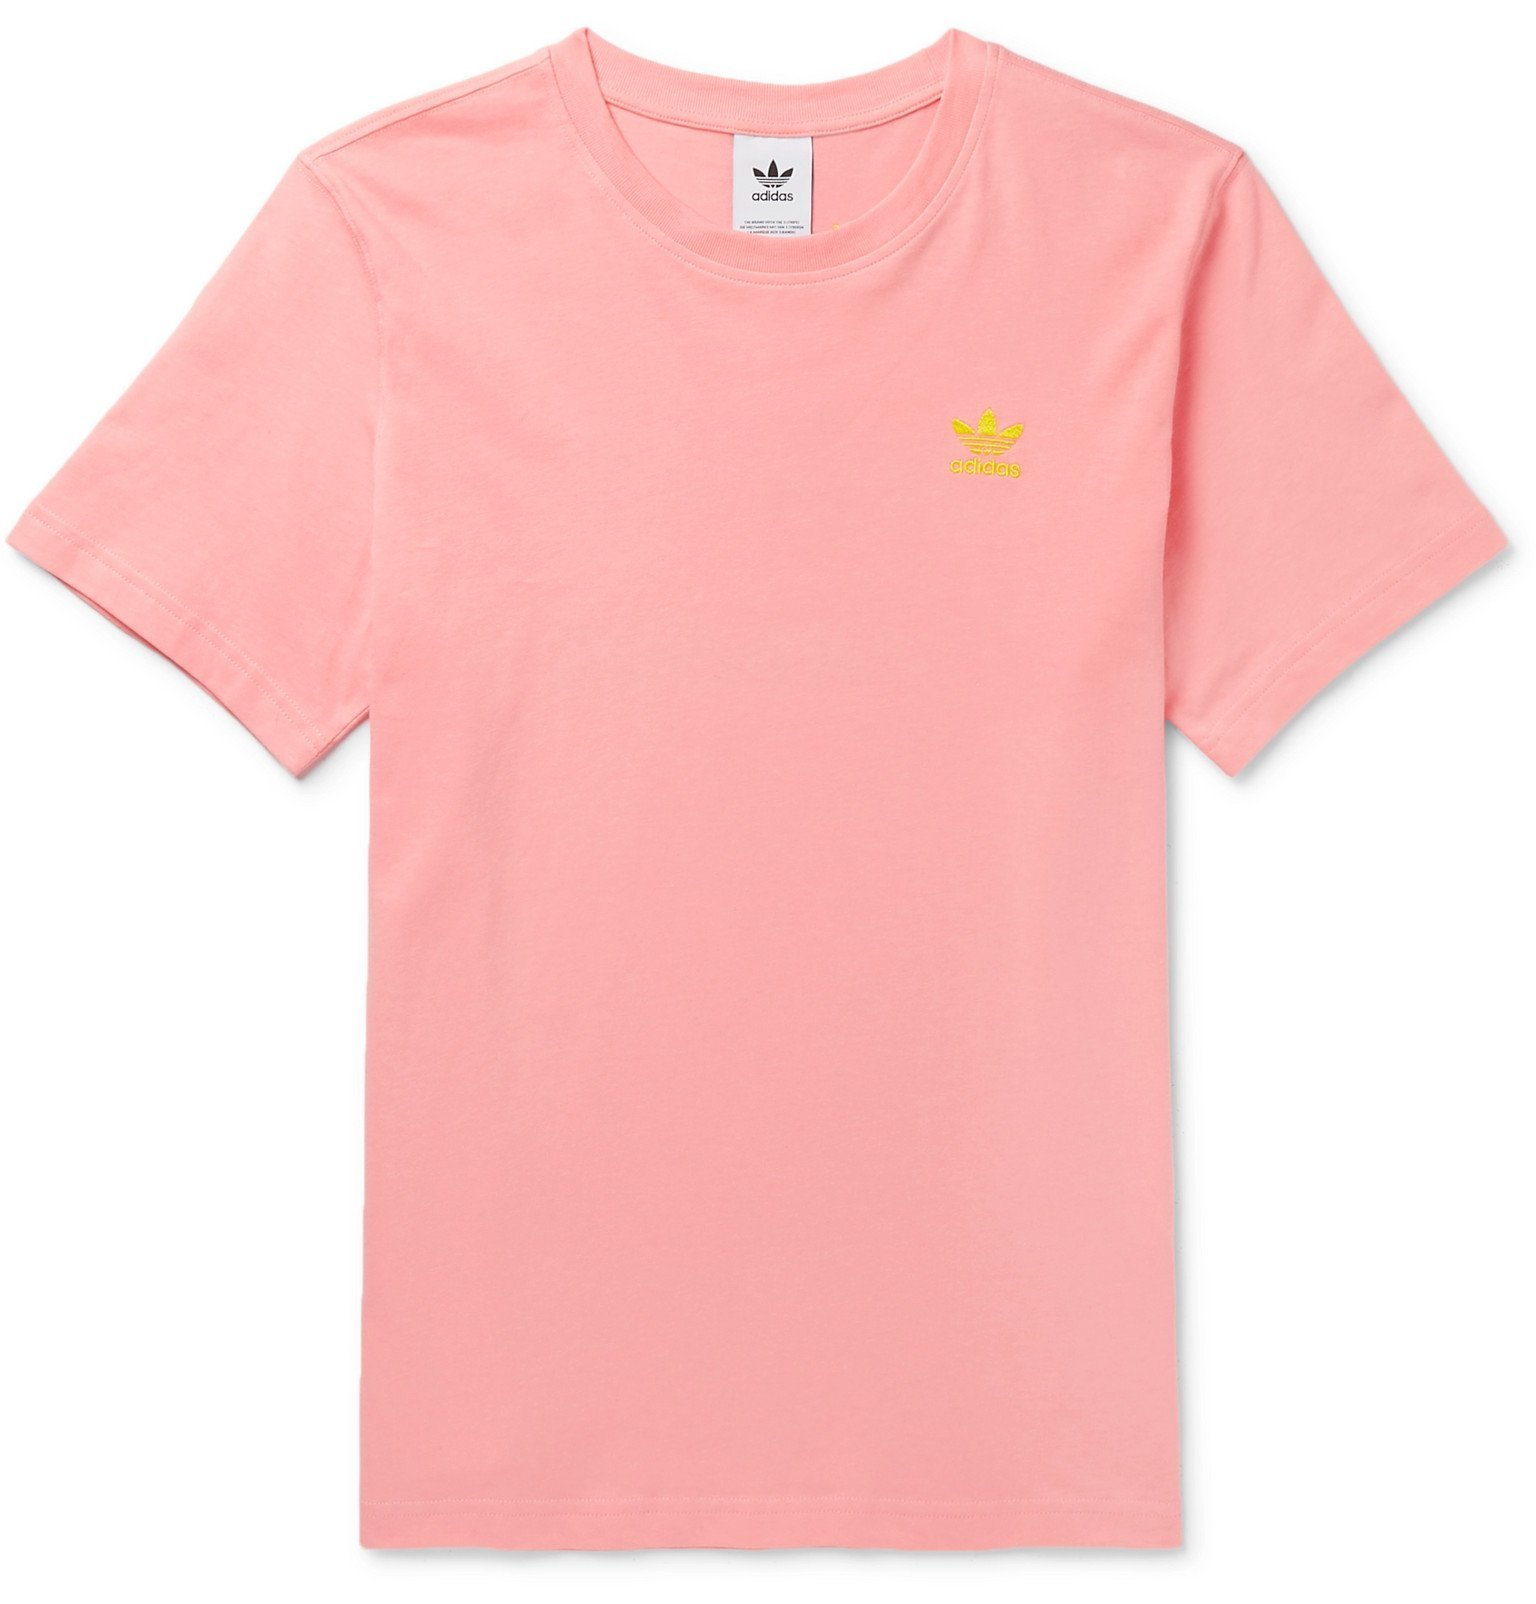 adidas Originals - Logo-Print Cotton-Jersey T-Shirt - Pink